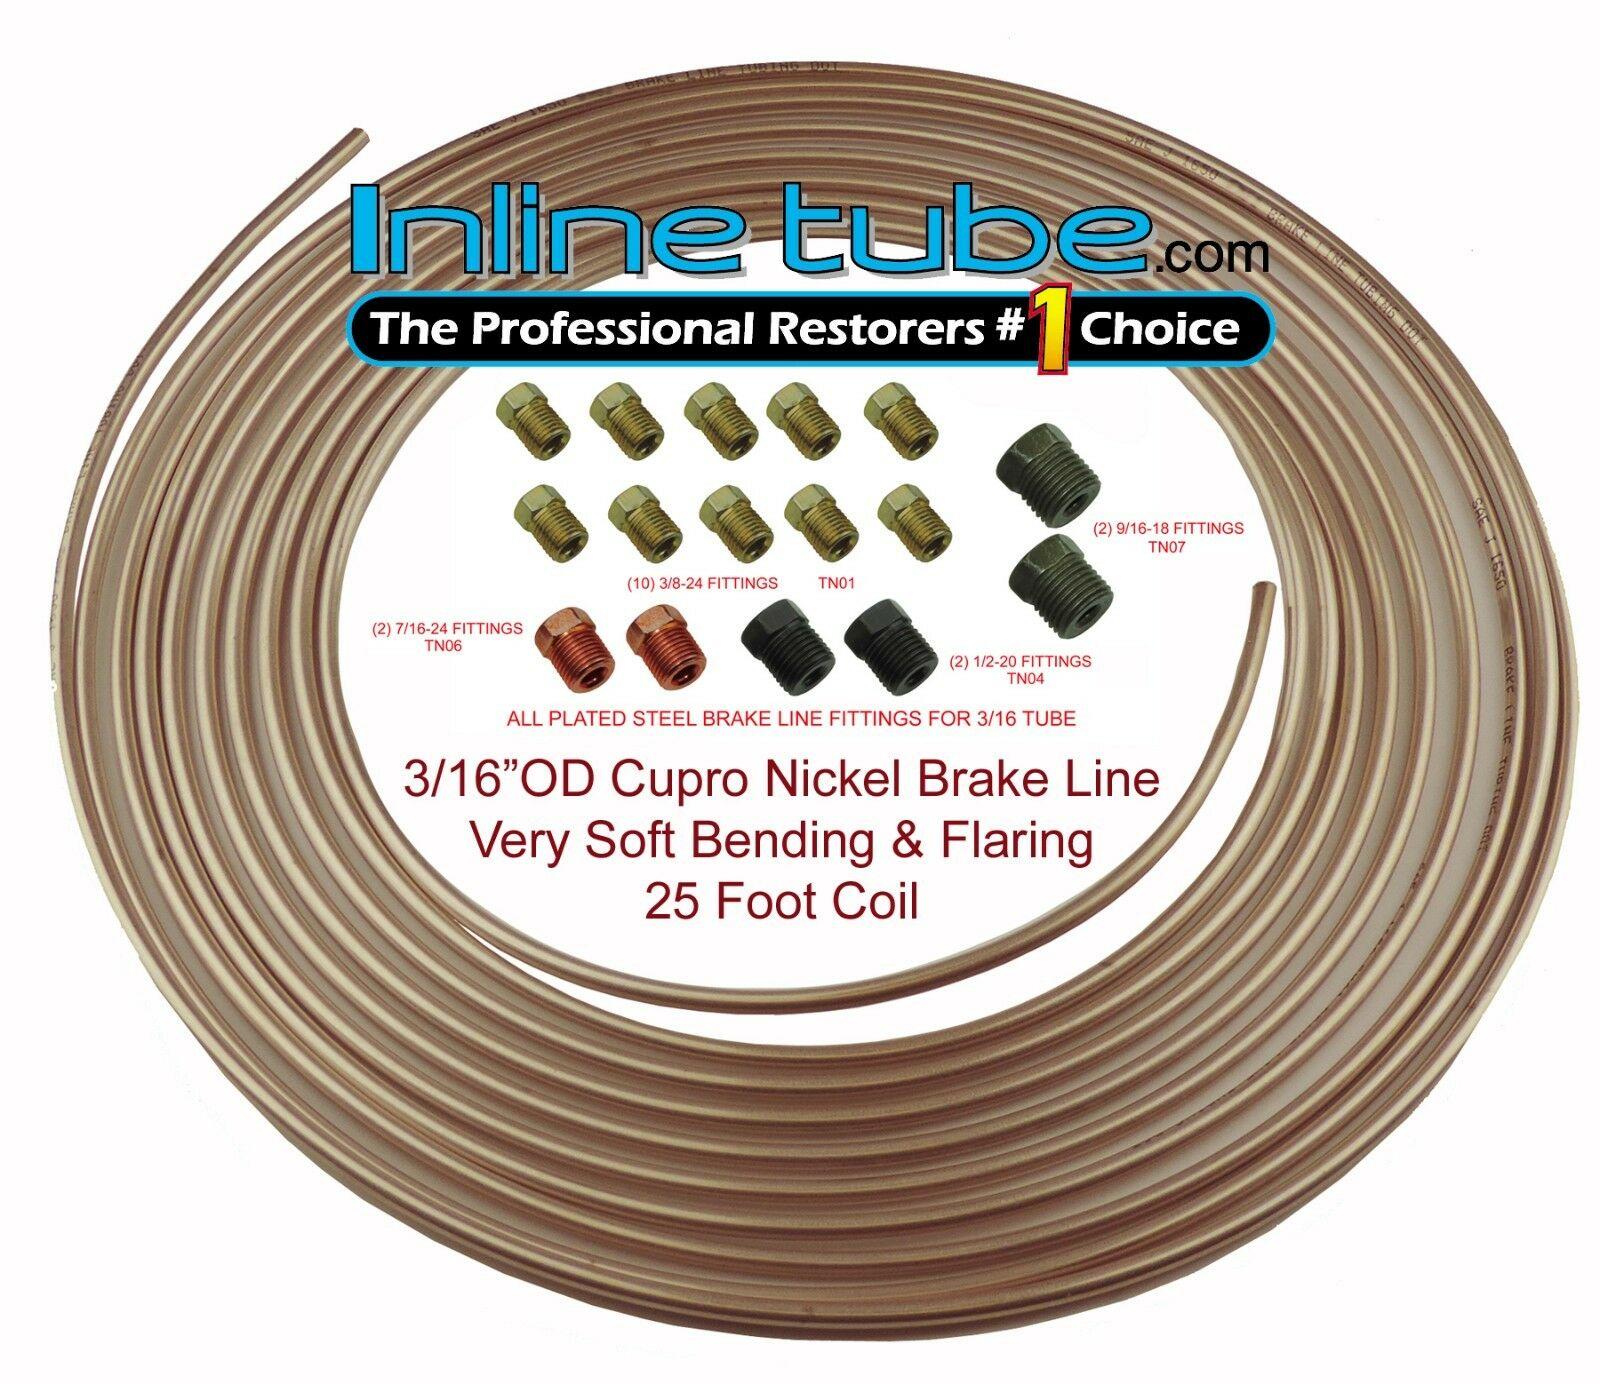 Brake//Fuel Pipe Clarik 5//16 X 2.5 Mtrs Cupro Nickel Kunifer